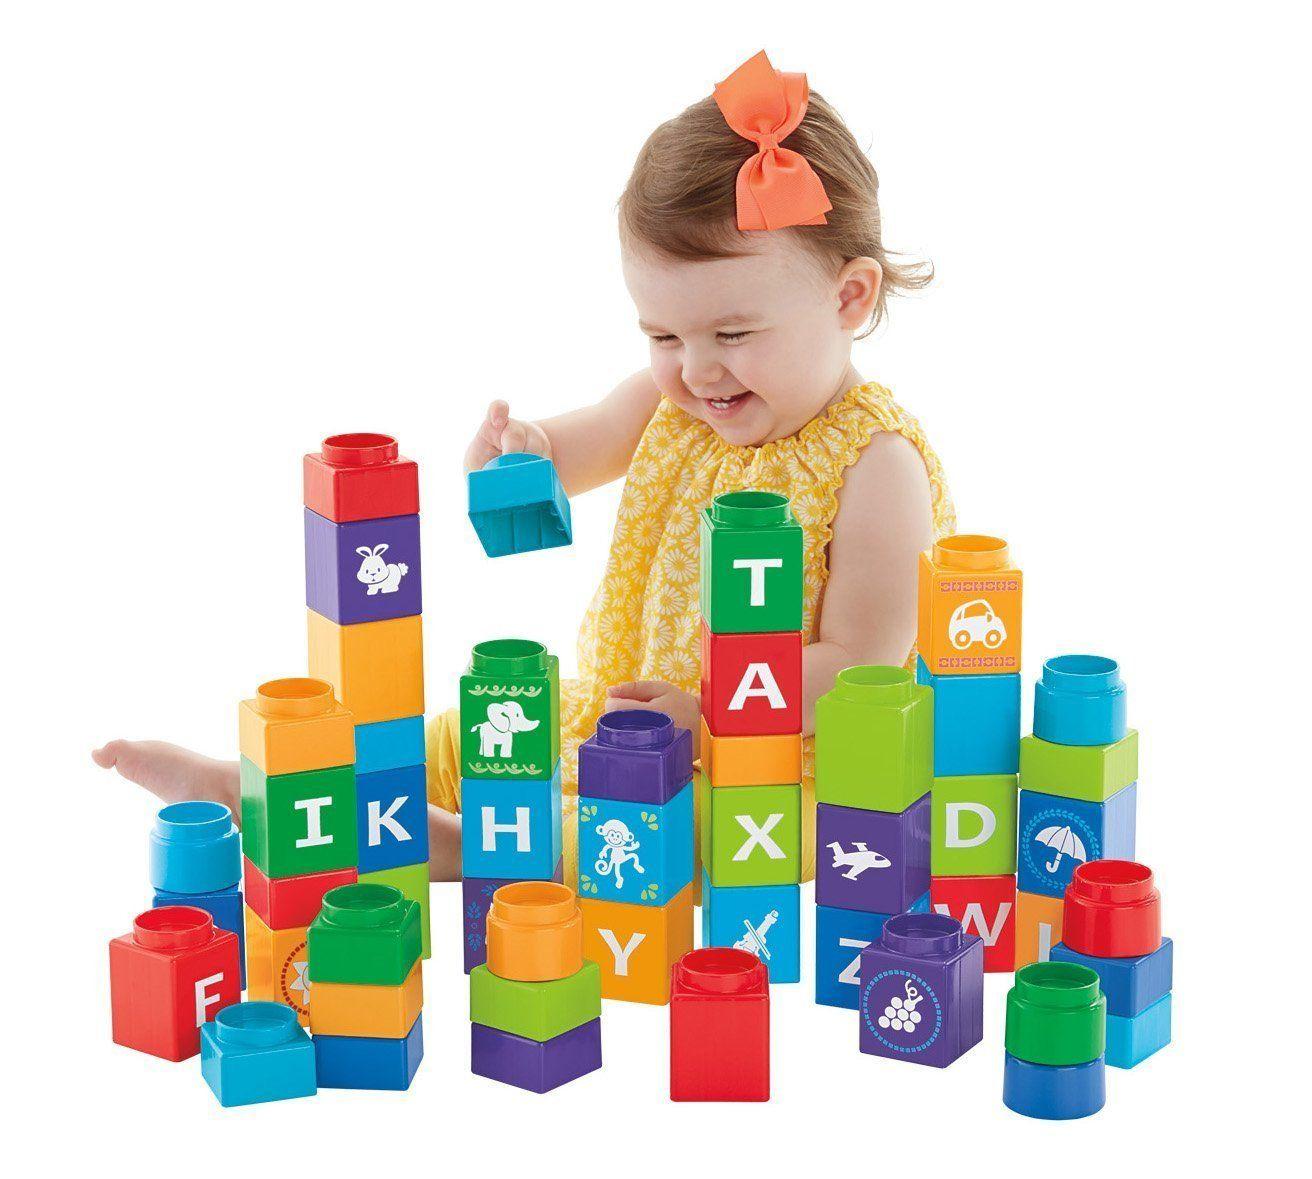 Robot Check Alphabet Blocks Learning The Alphabet Learning Toys